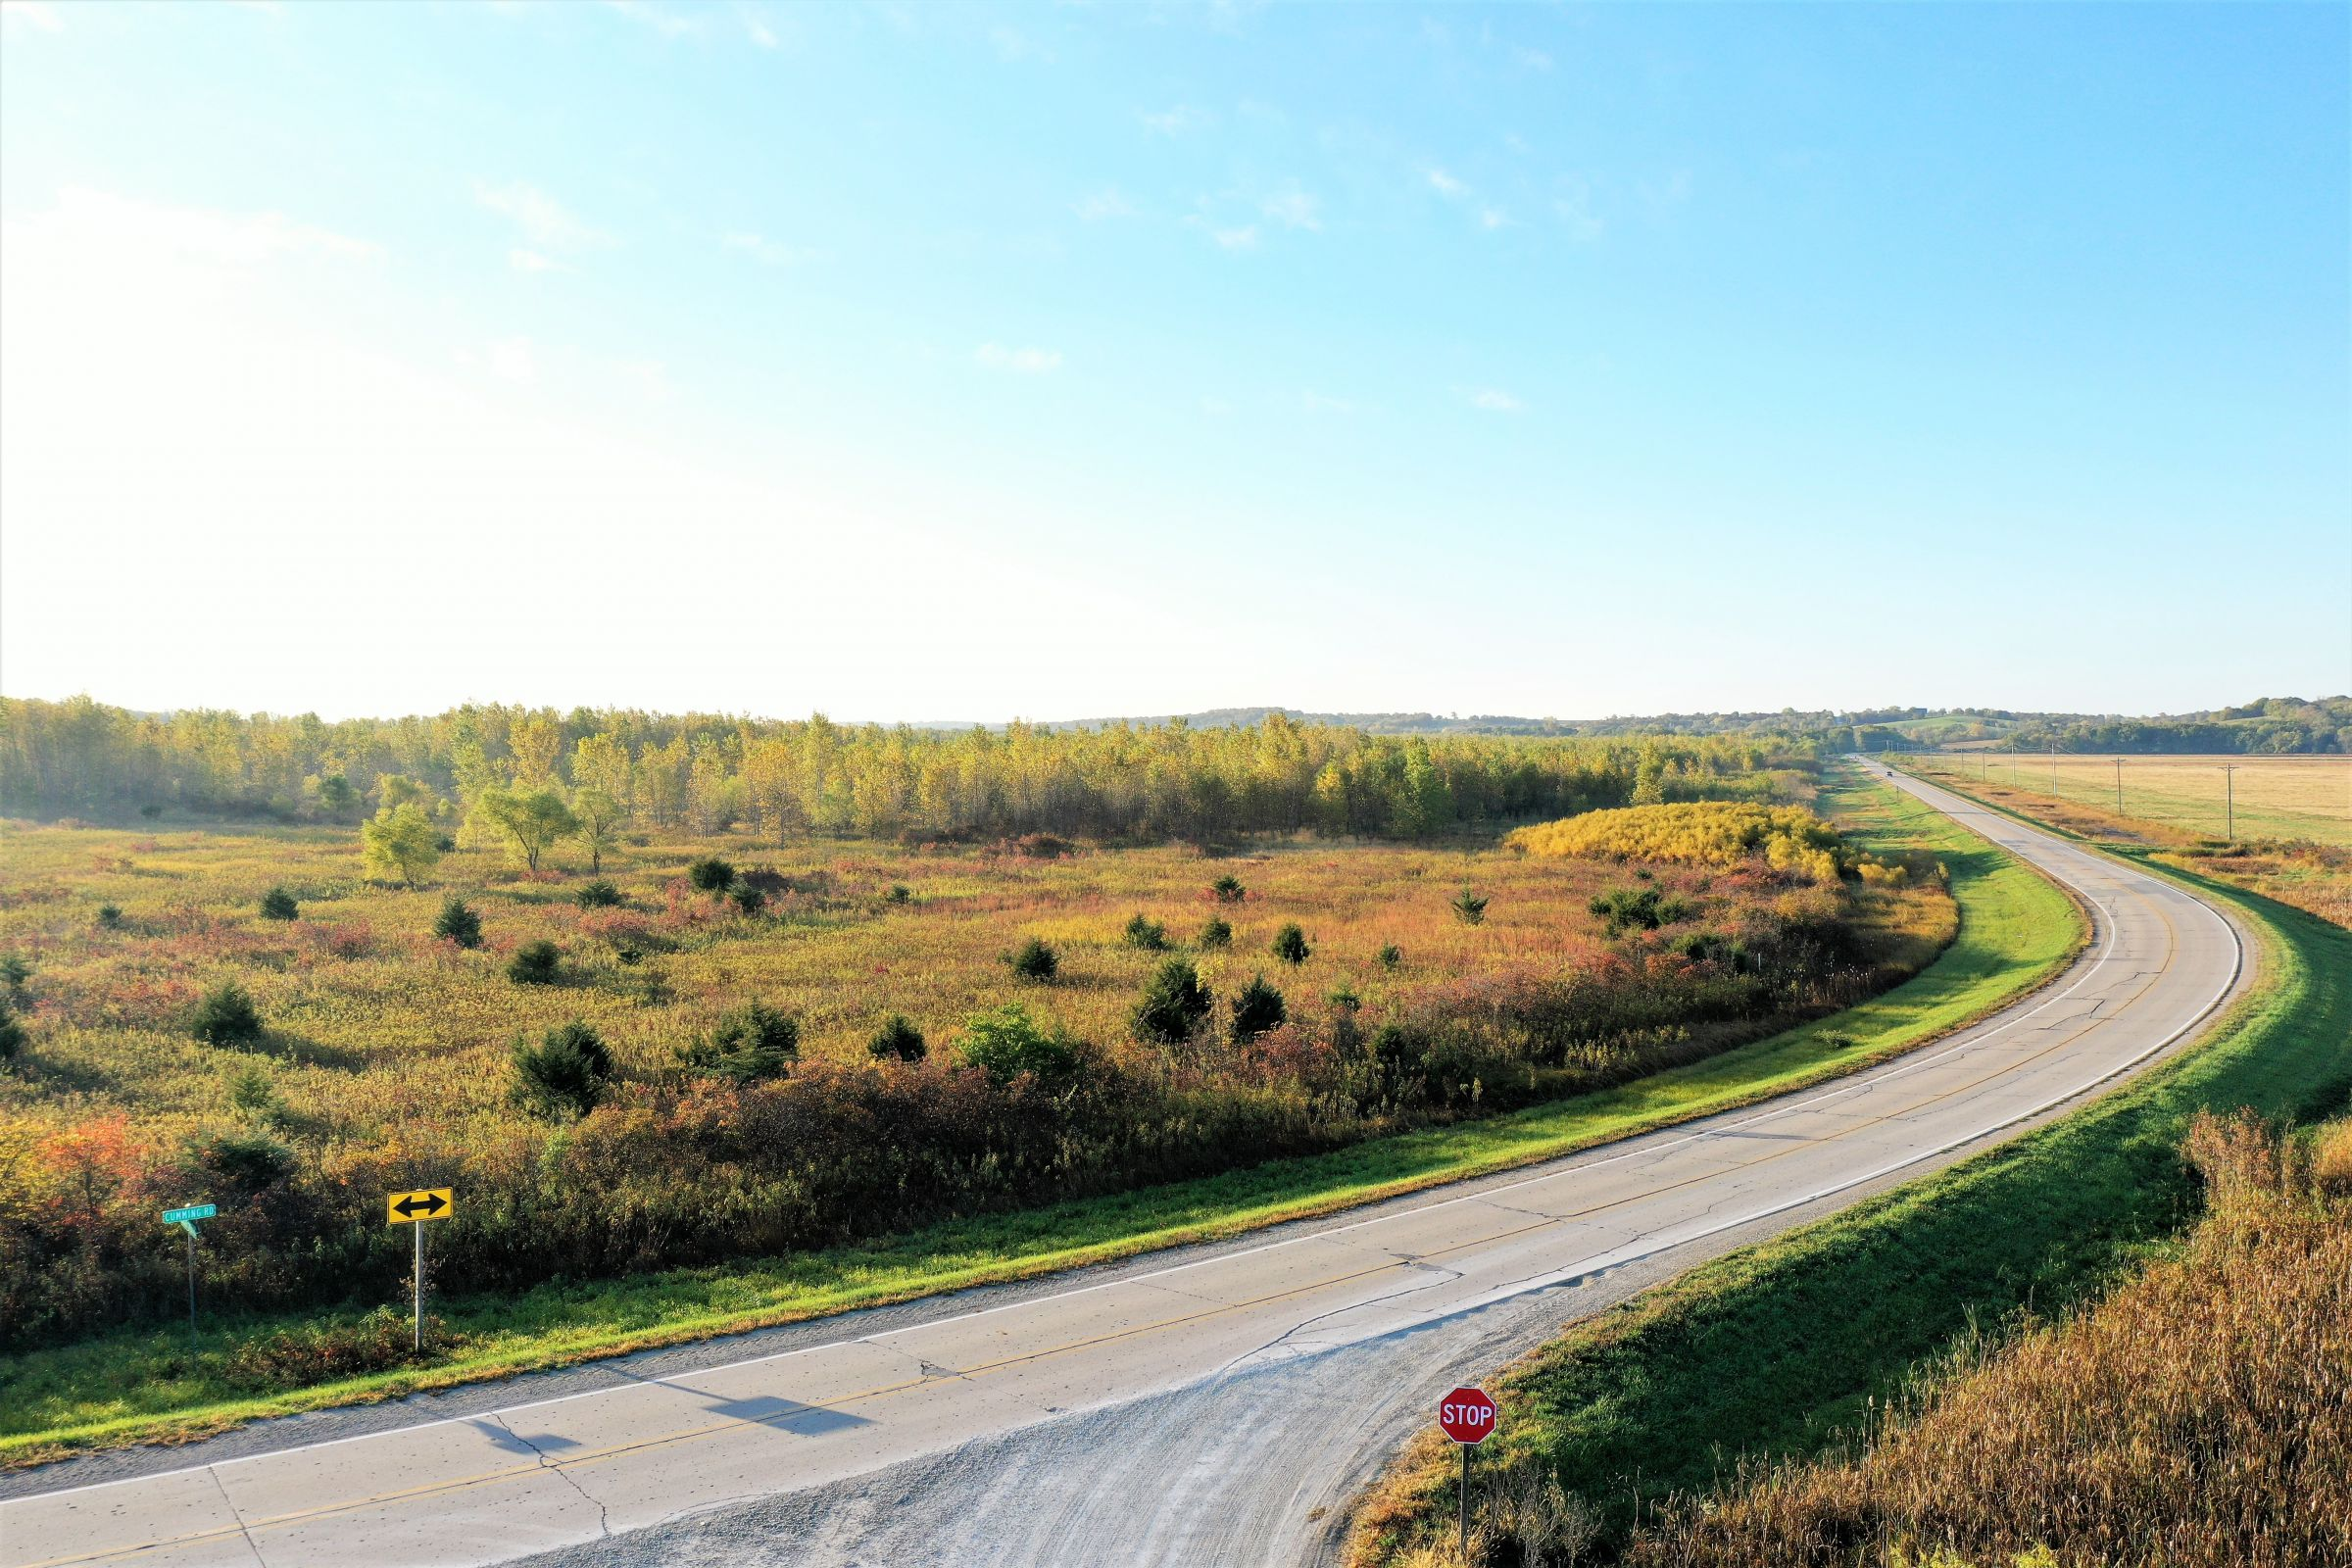 development-land-madison-county-iowa-267-acres-listing-number-15200-0-2020-10-06-184658.jpg